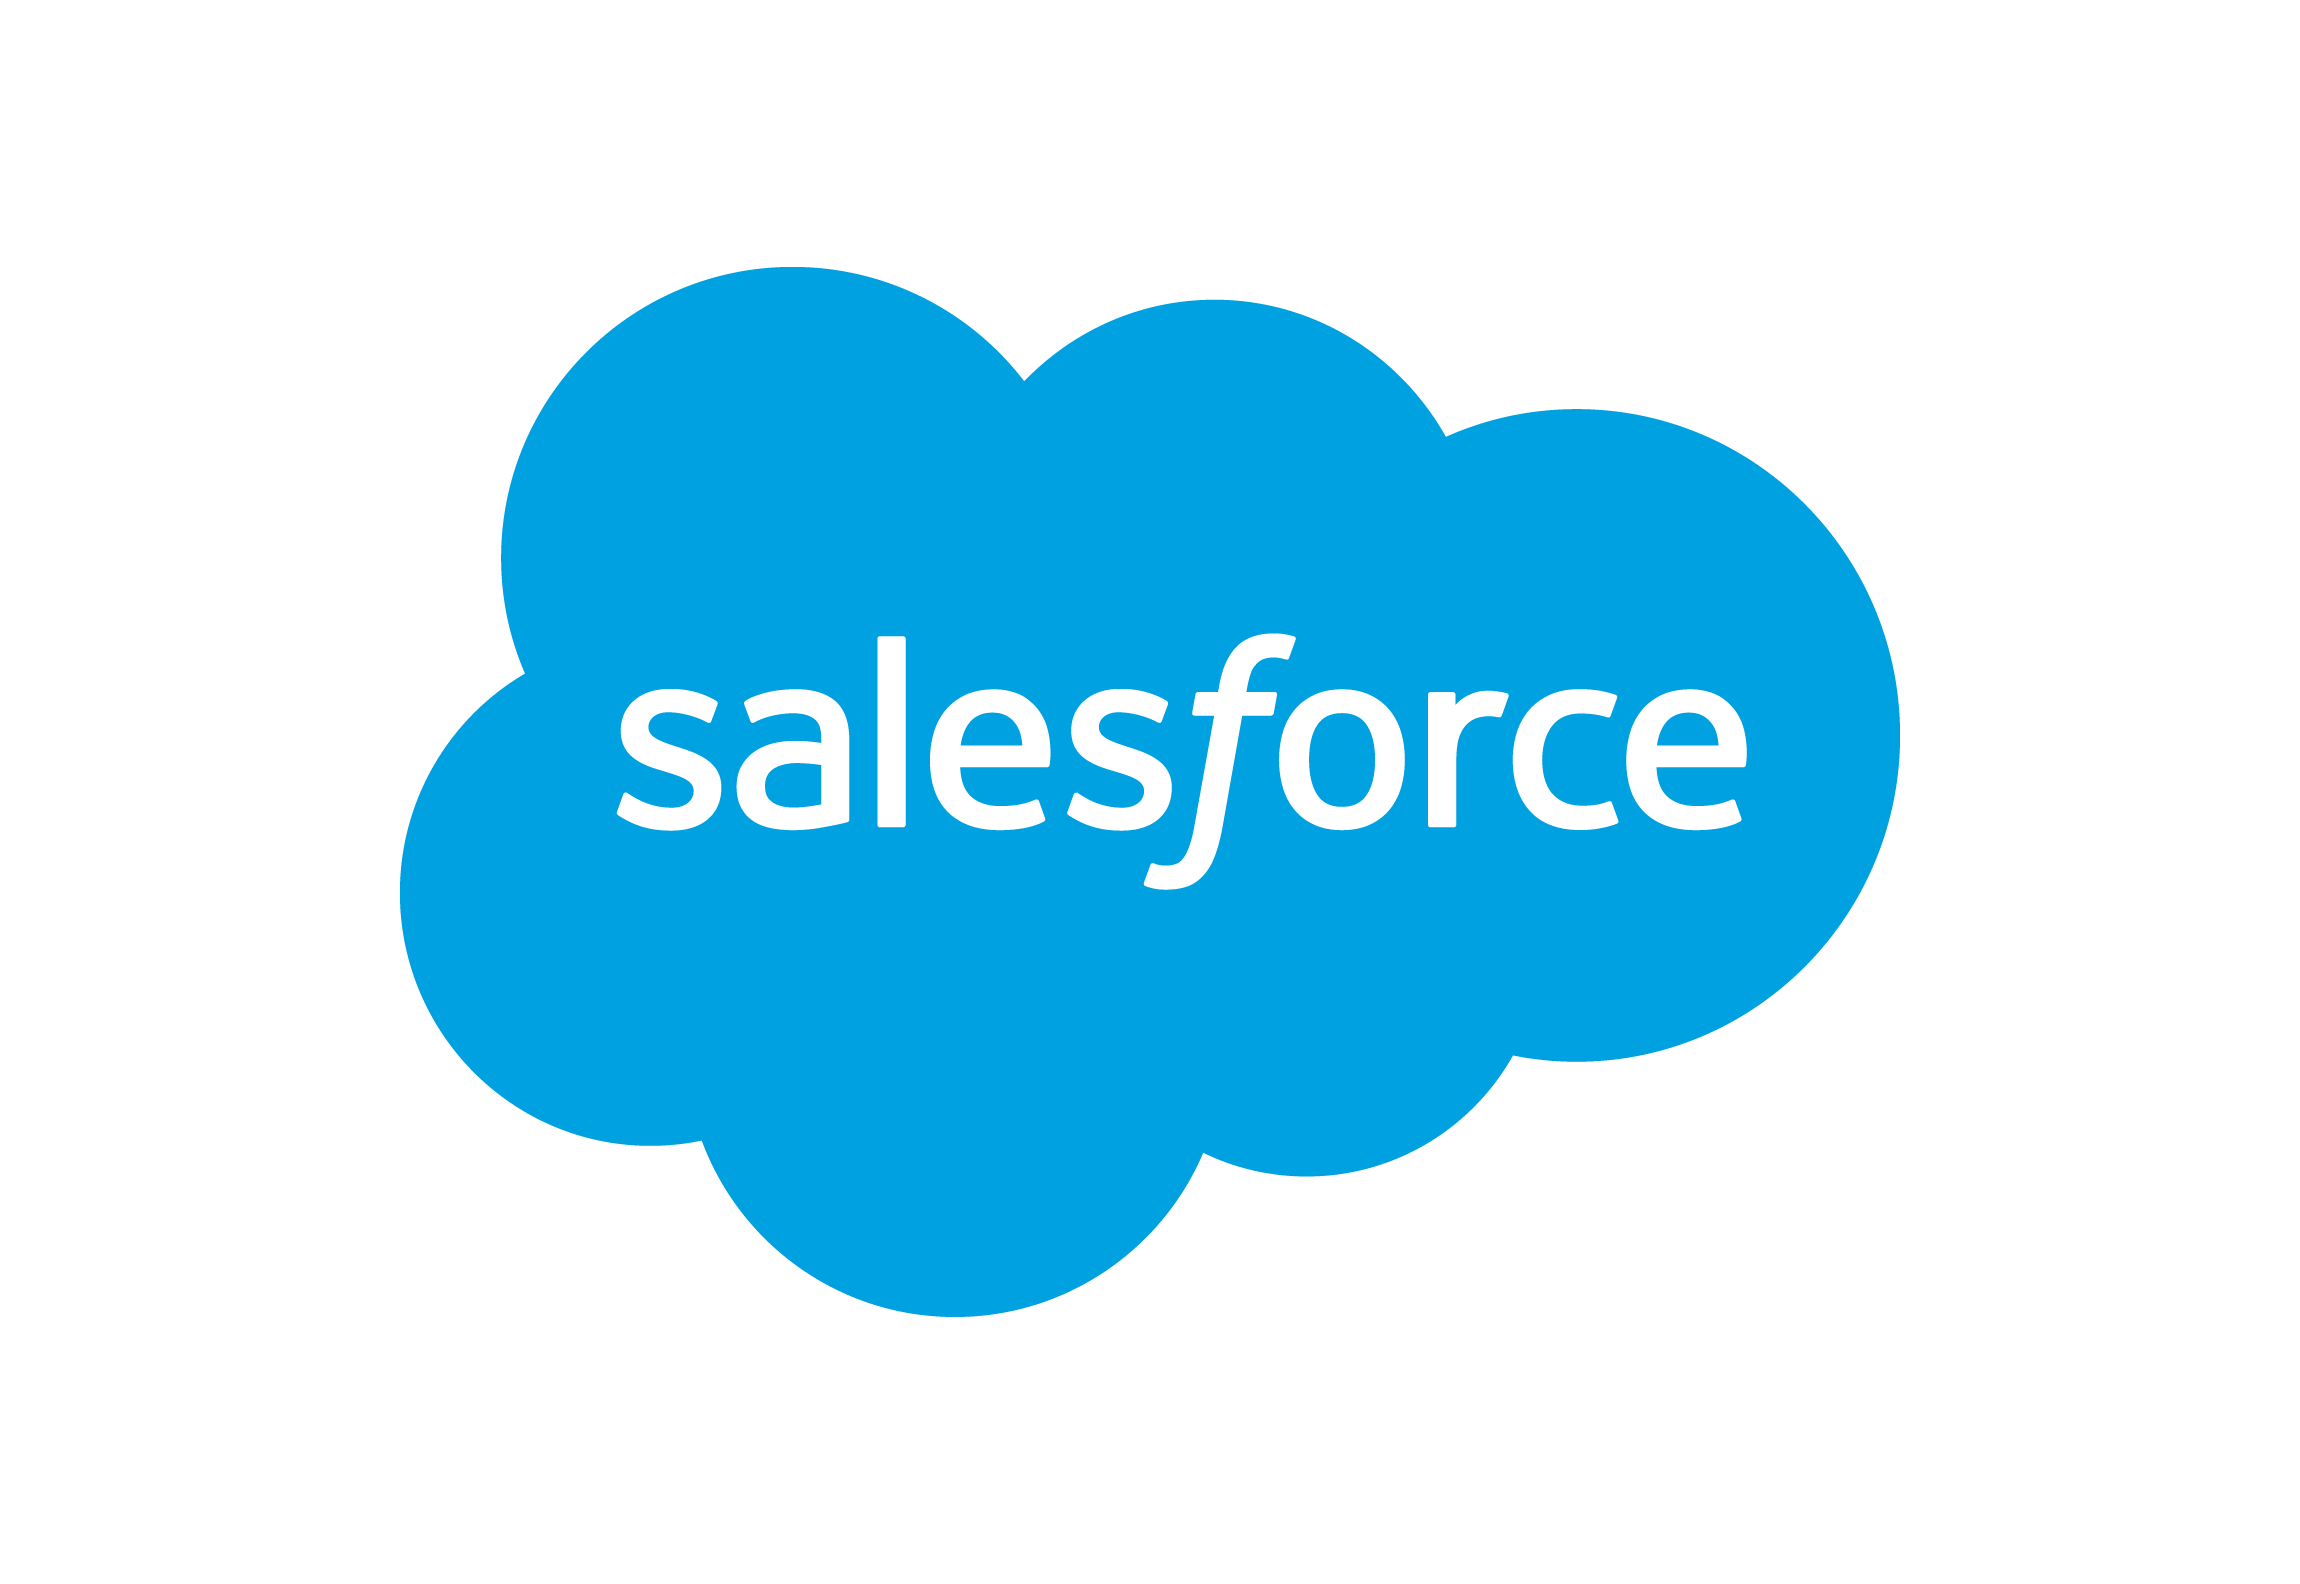 . PlusPng.com Salesforce-logo.png PlusPng.com  - Salesforce Logo Vector PNG